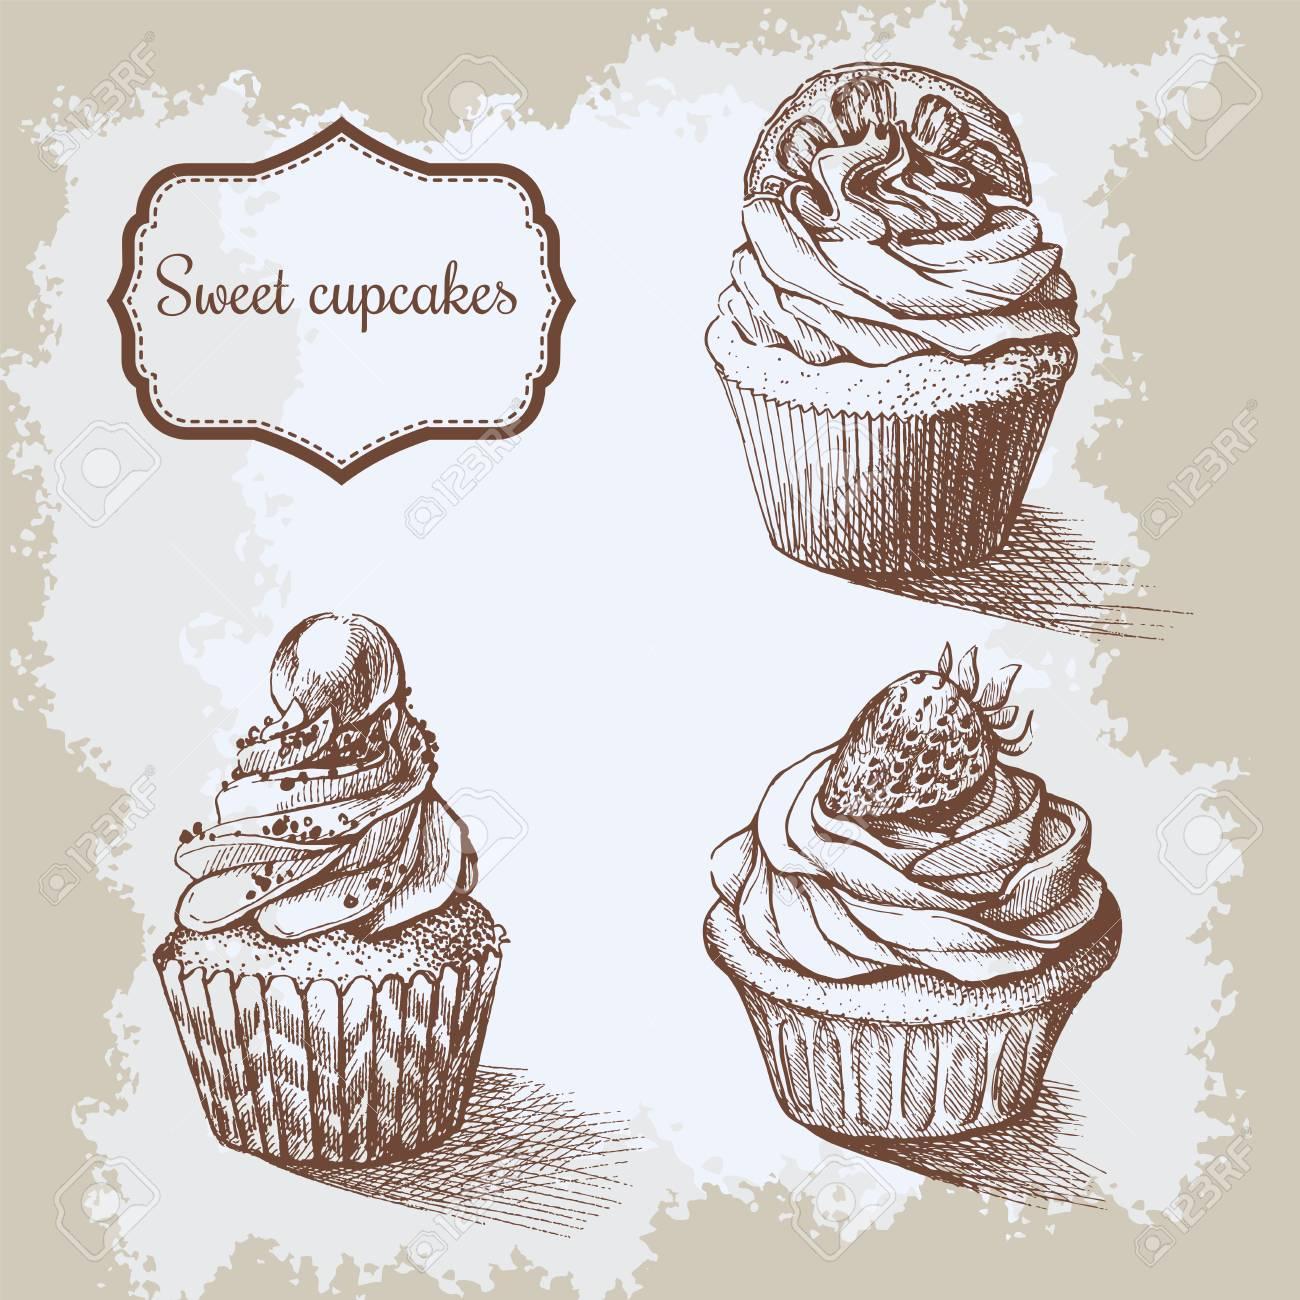 Fondo Vintage Dulces Cupcakes Con Limón. Fresa Y Perla. Establecer ...